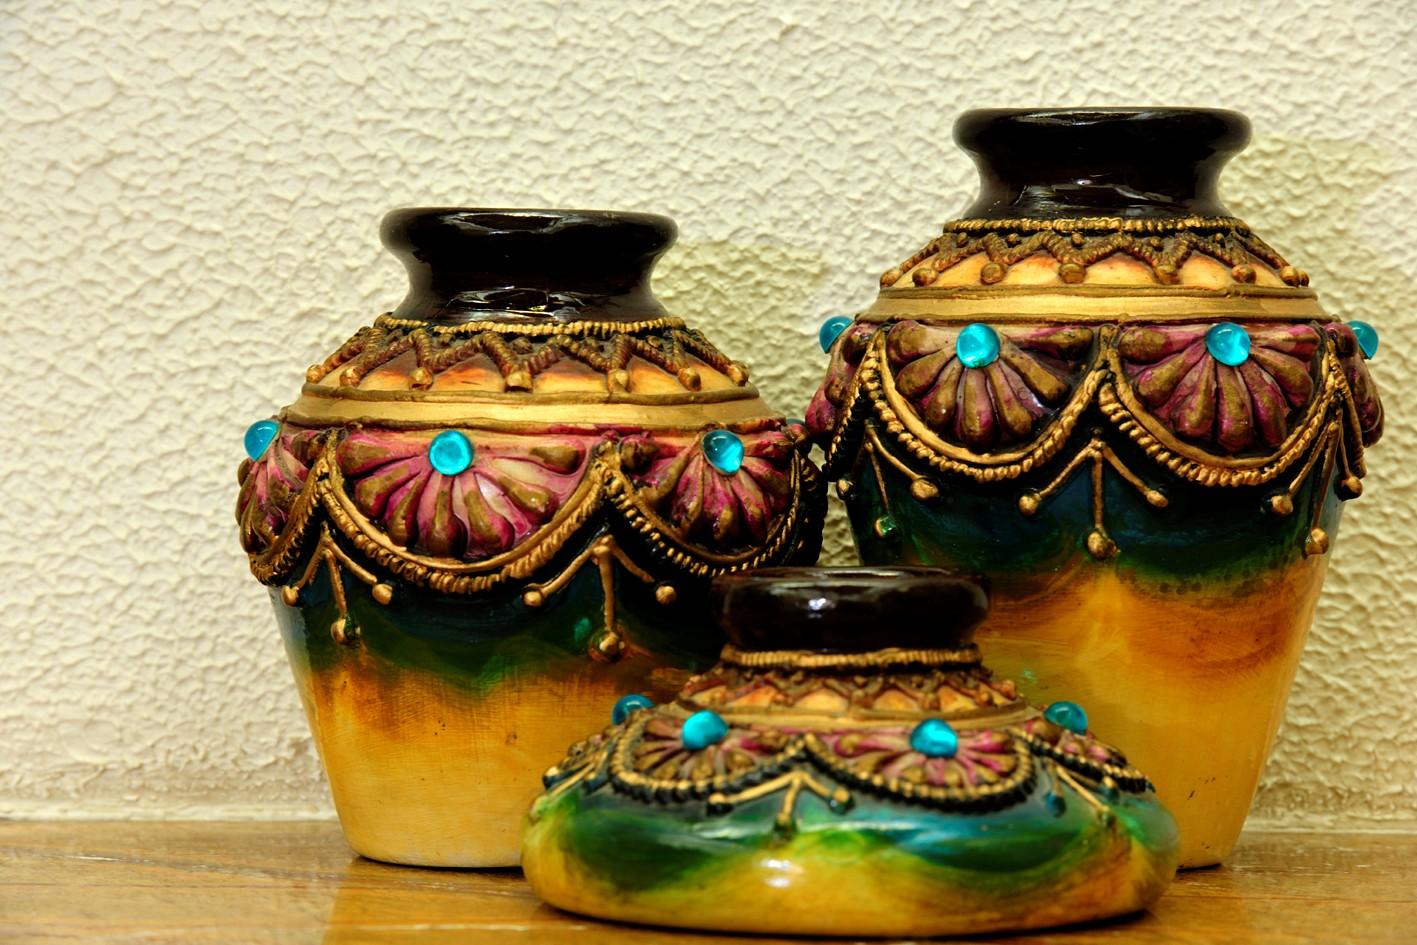 lagos affordable piece decorative collections buy pot white for modern plants planters gold parcel decor pots online